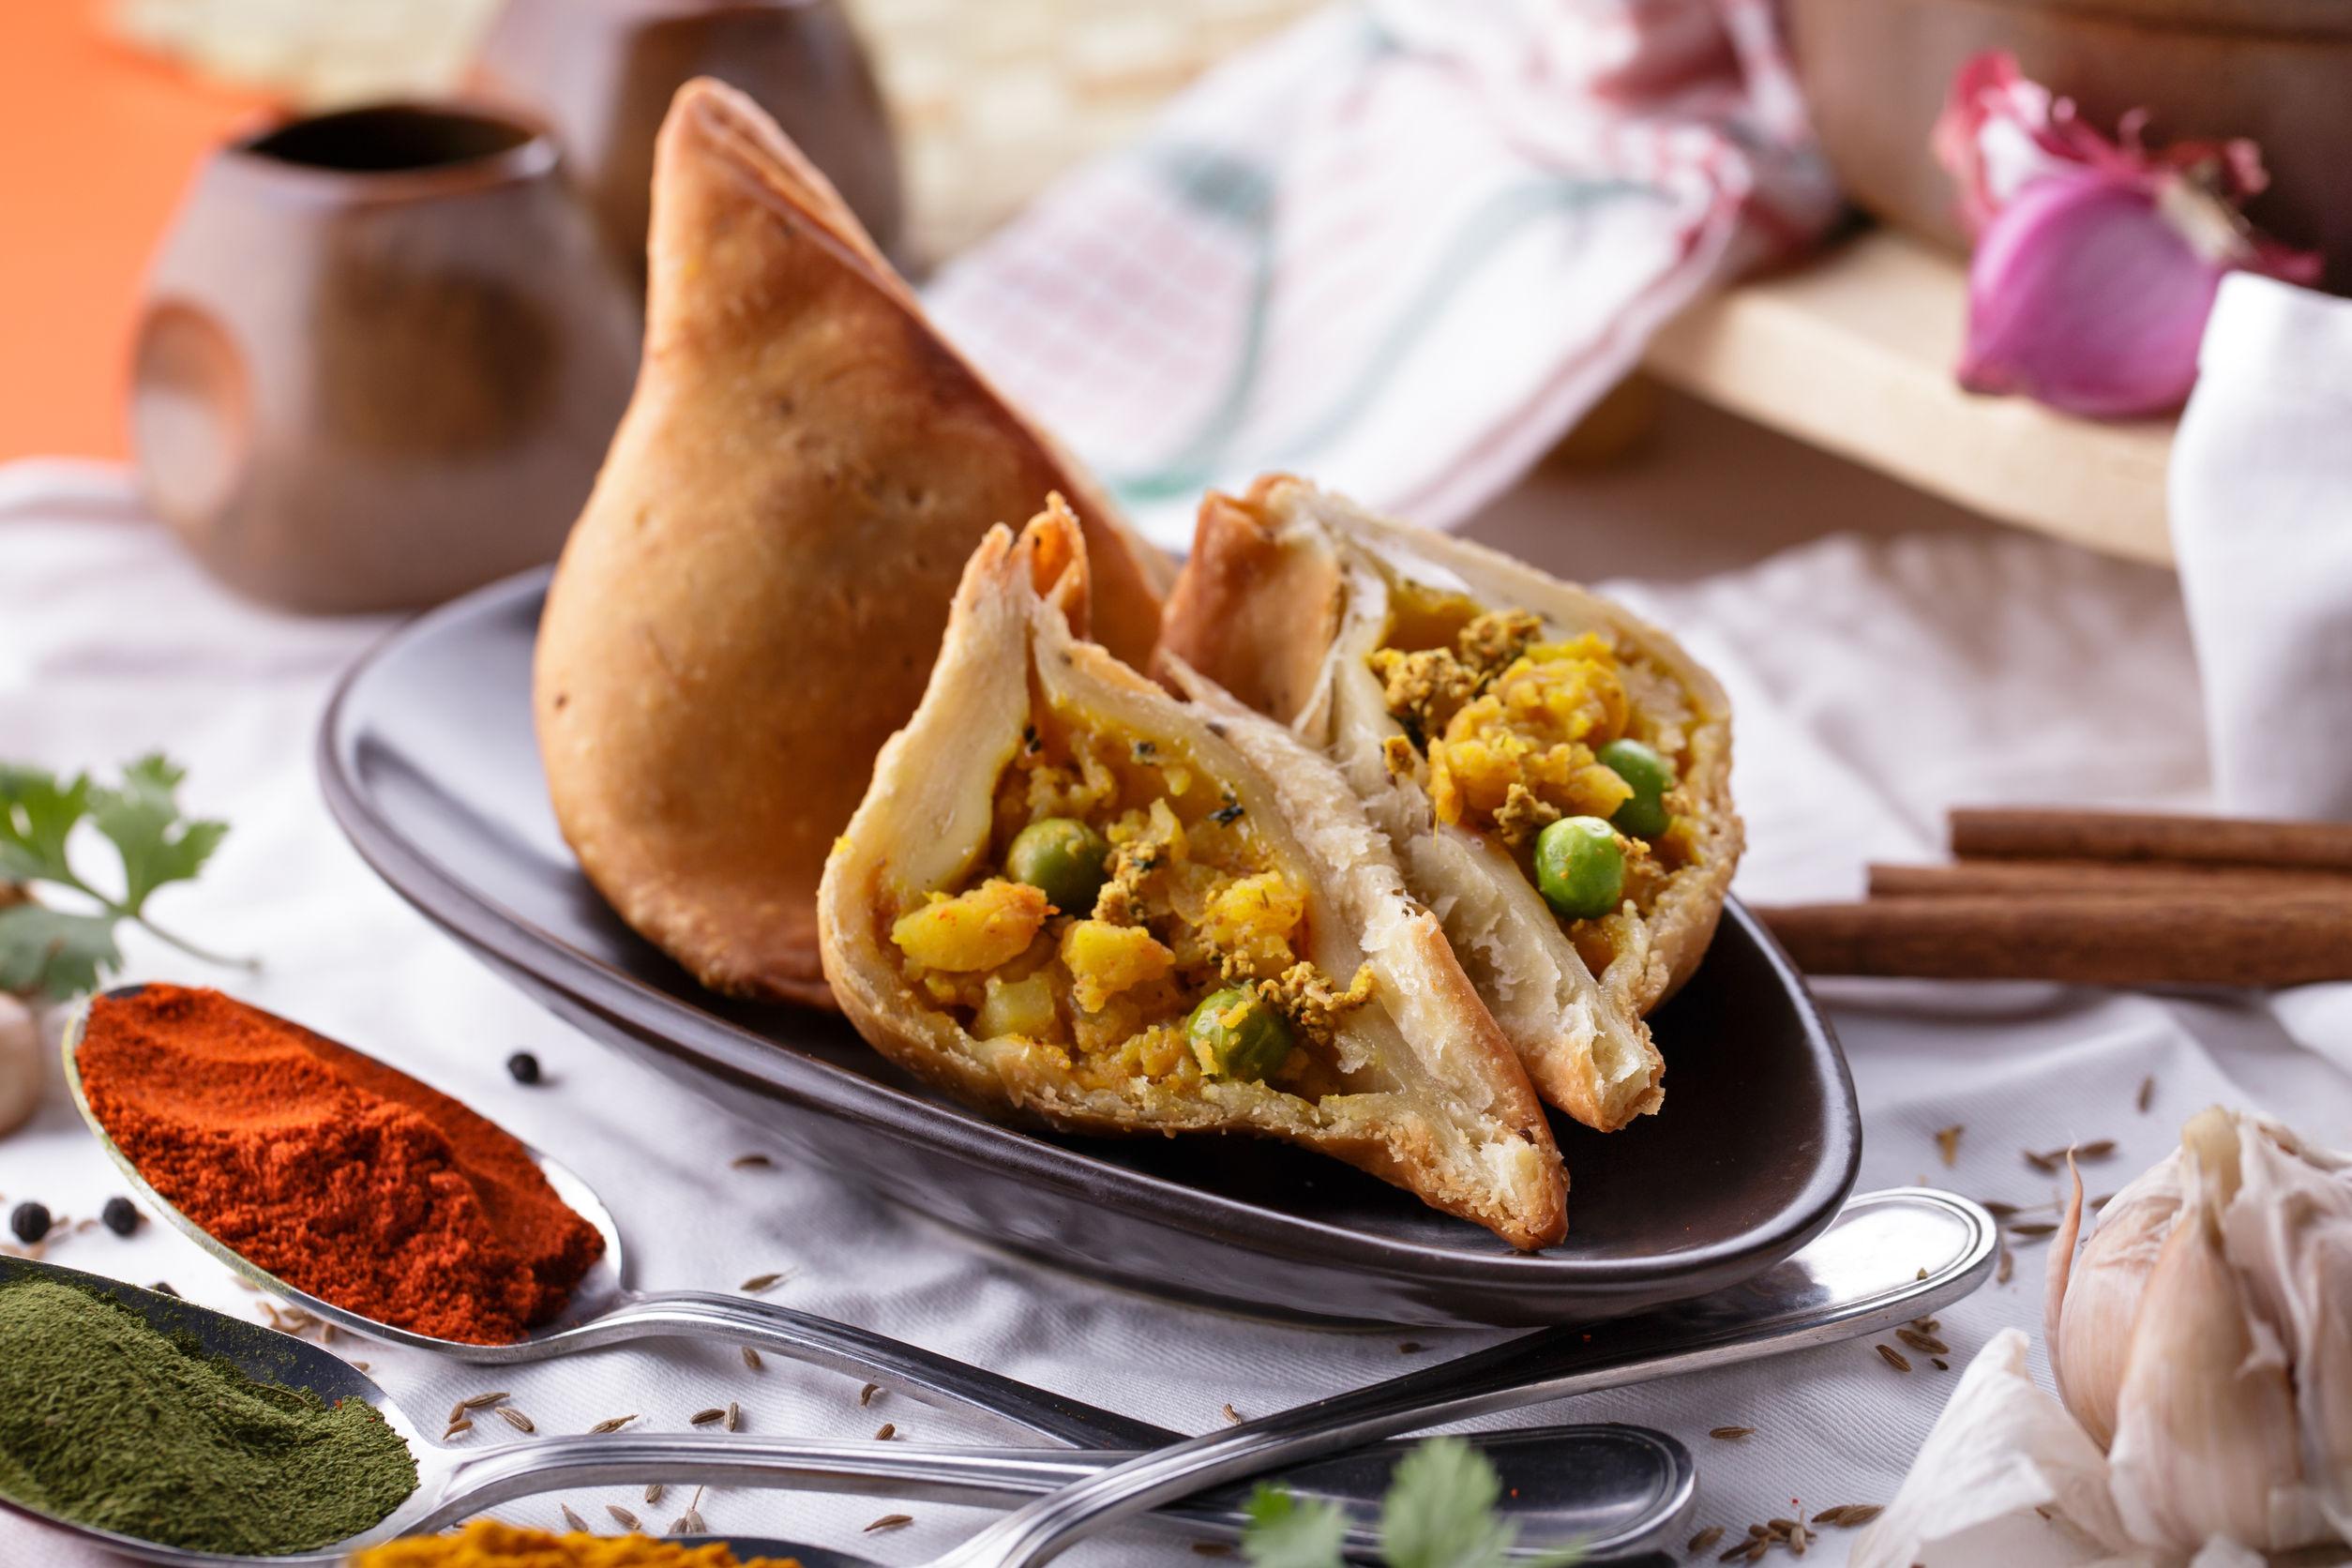 Svet orientu #4: Indická kuchyňa